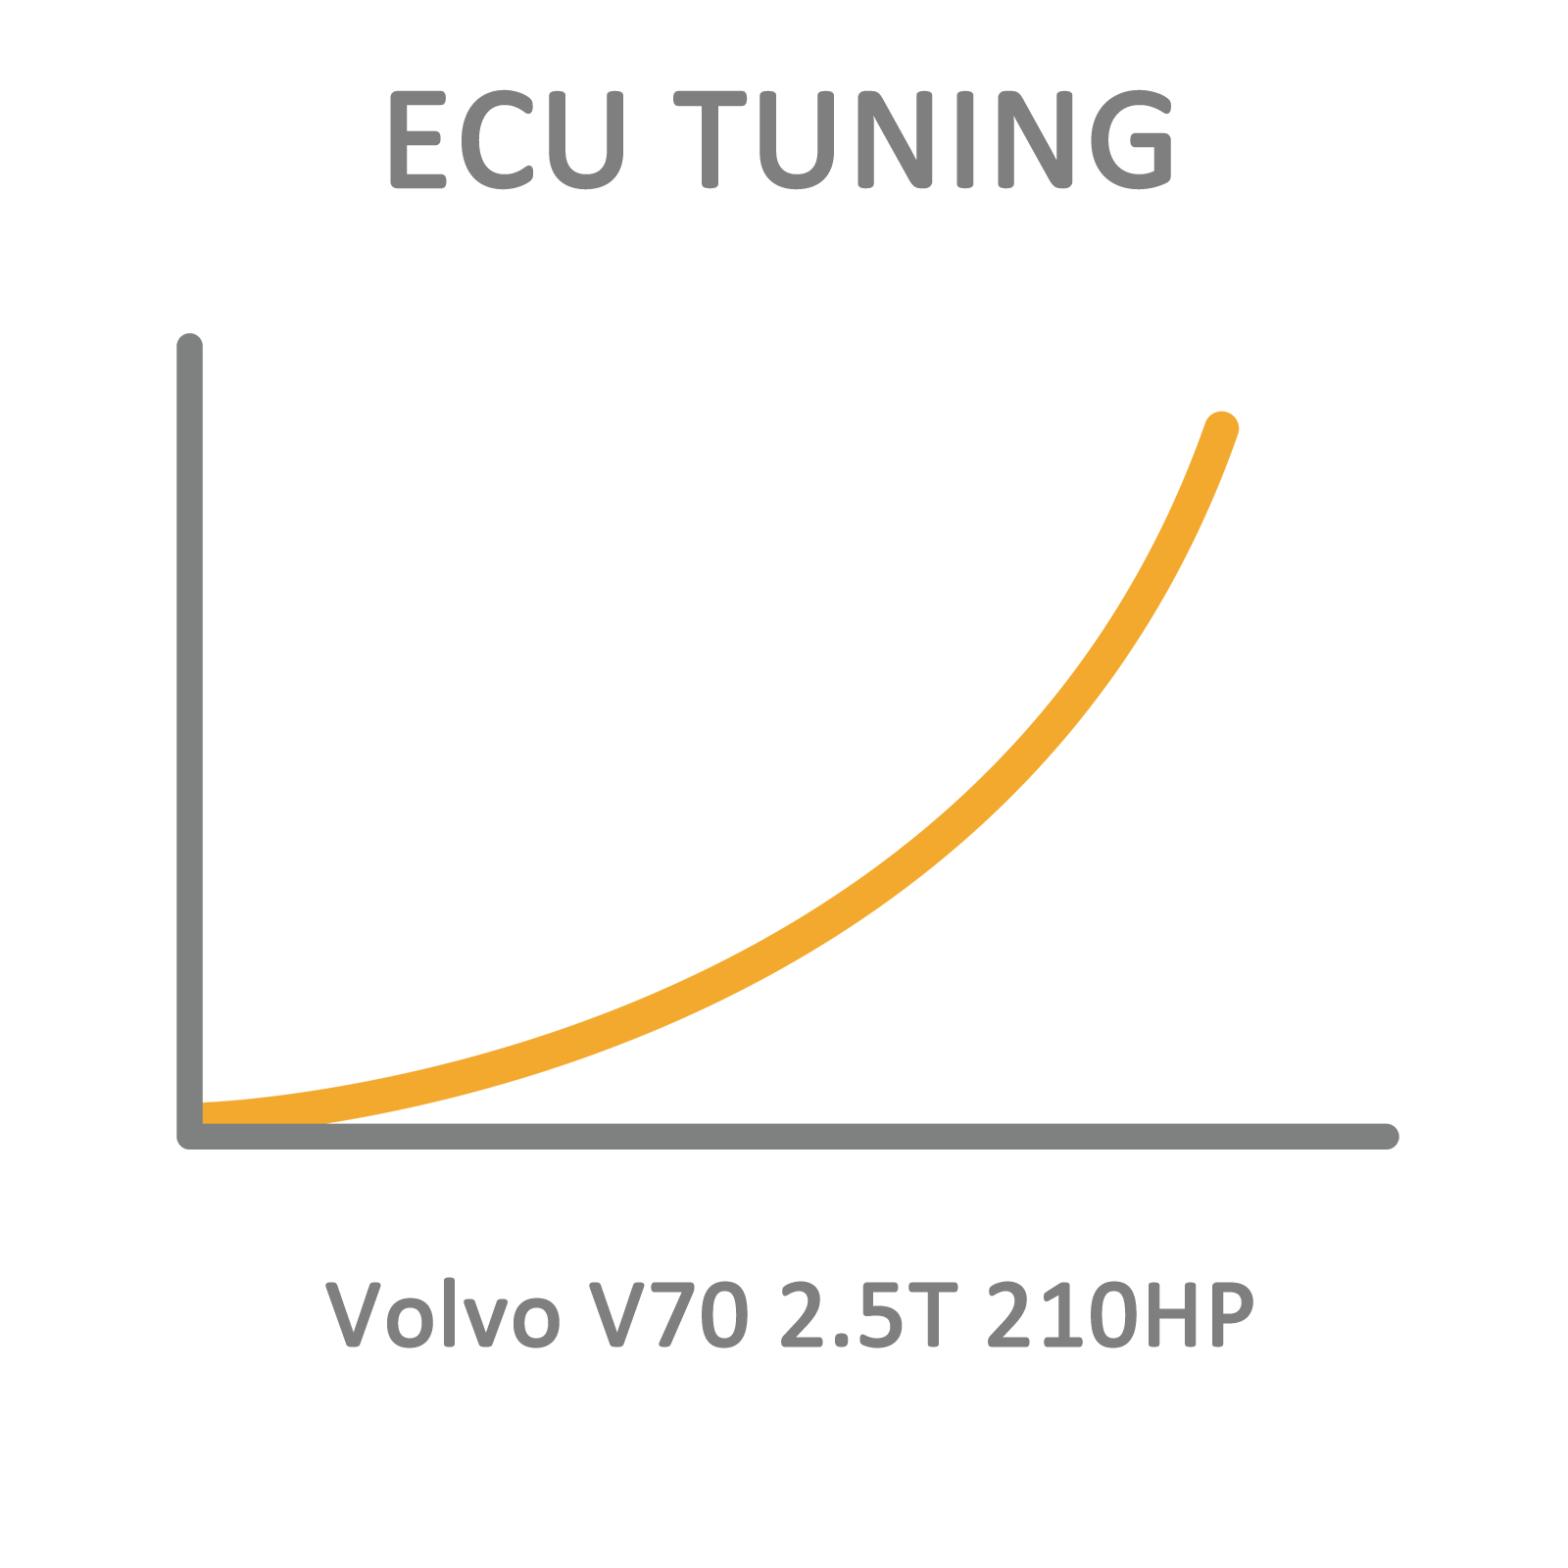 Volvo V70 2.5T 210HP ECU Tuning Remapping Programming